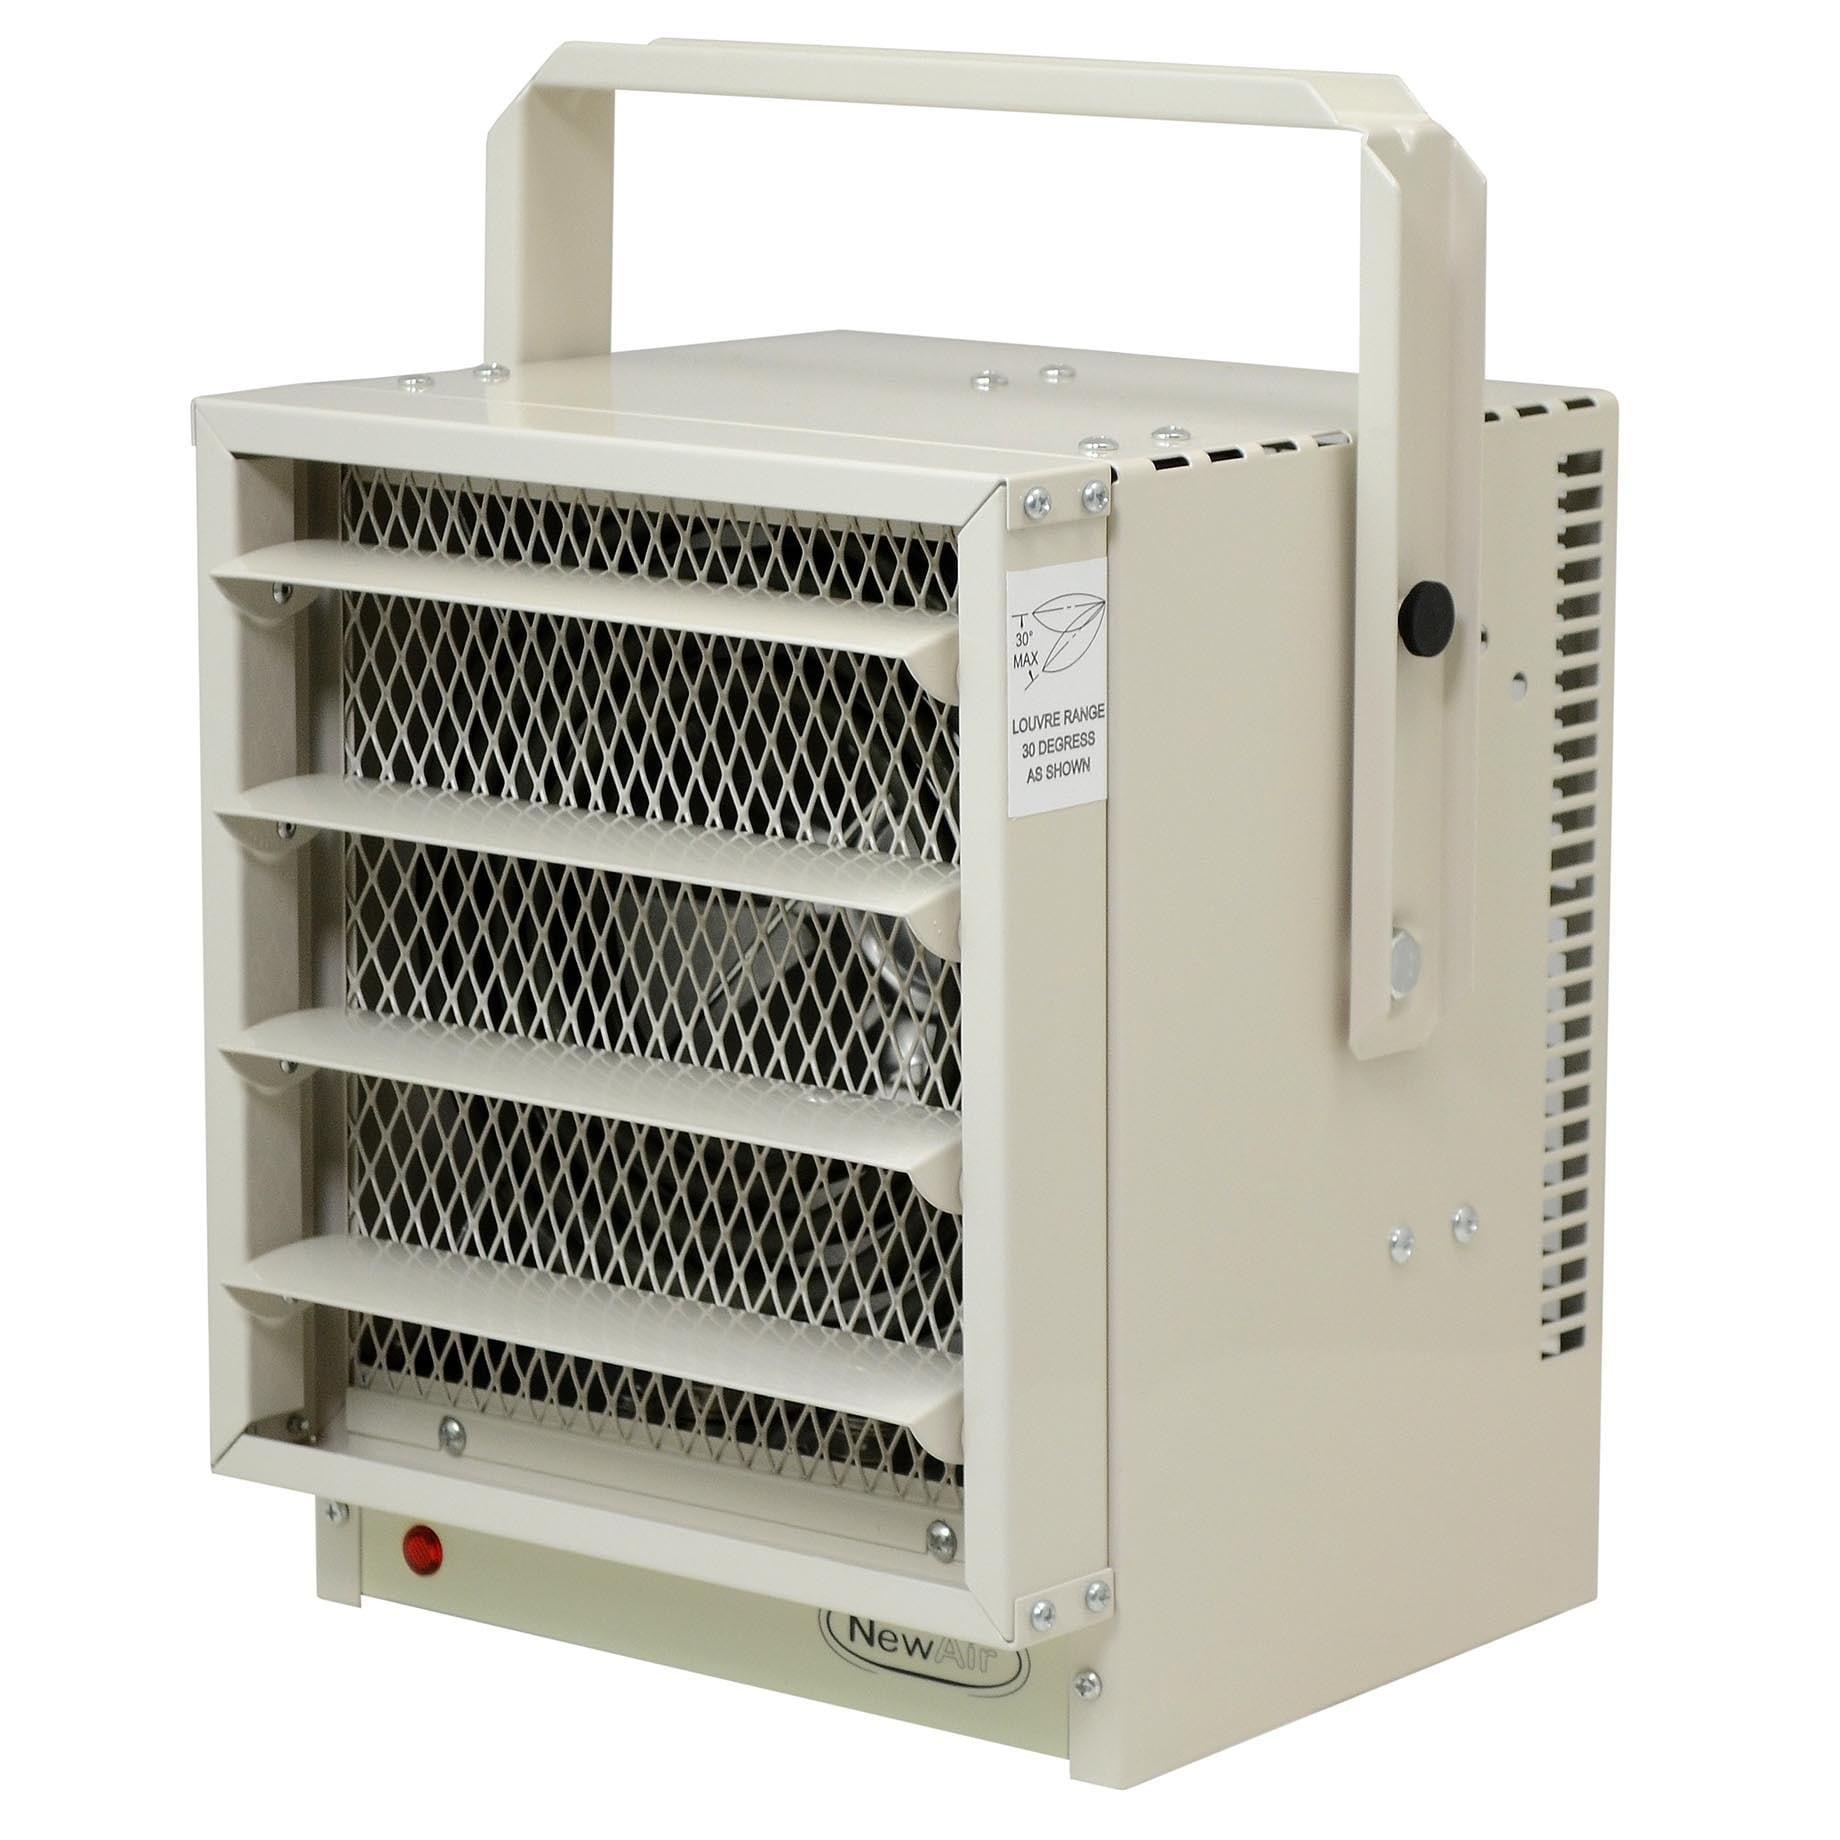 NewAir Appliances Electric Garage Heater (Commercial grad...